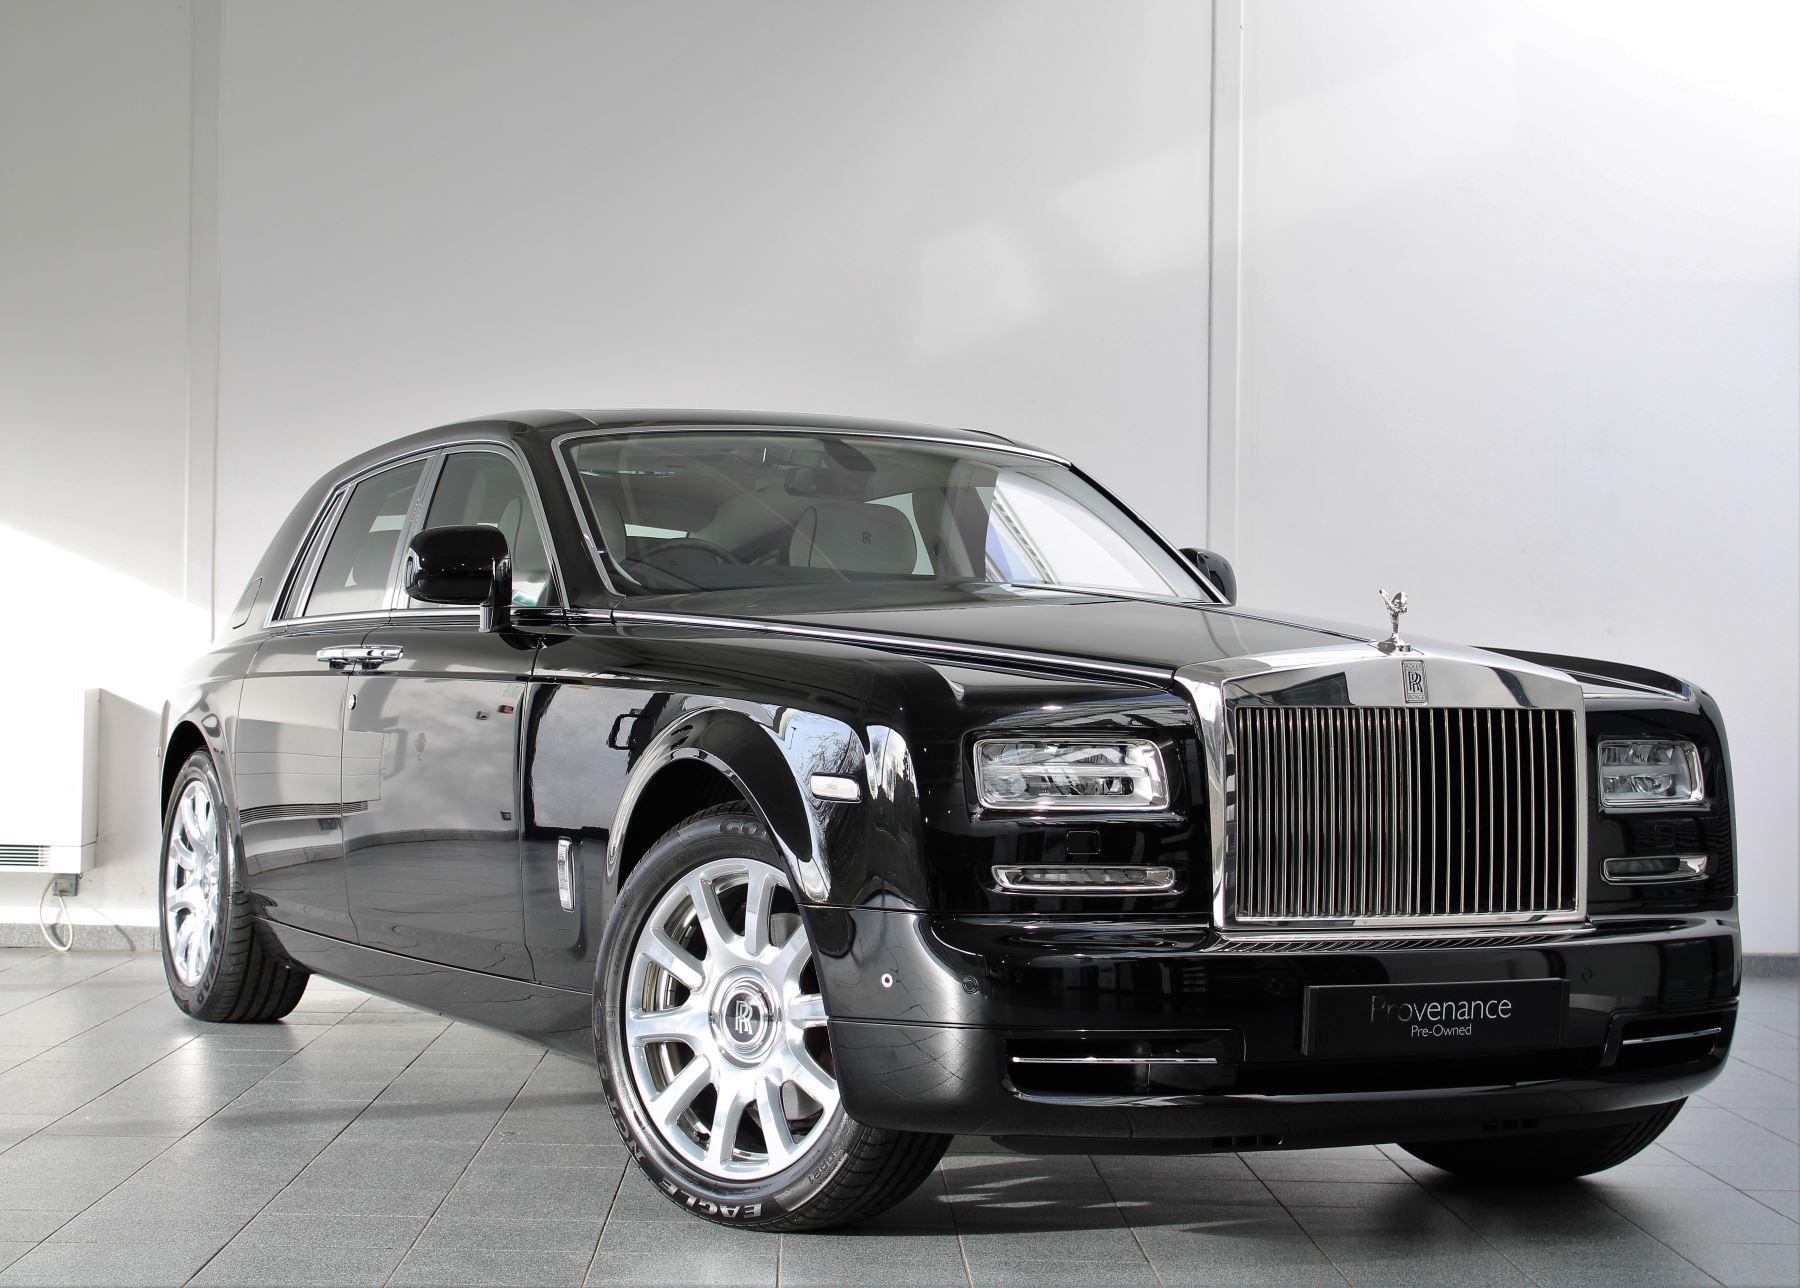 Rolls-Royce Phantom II 4dr Auto image 1